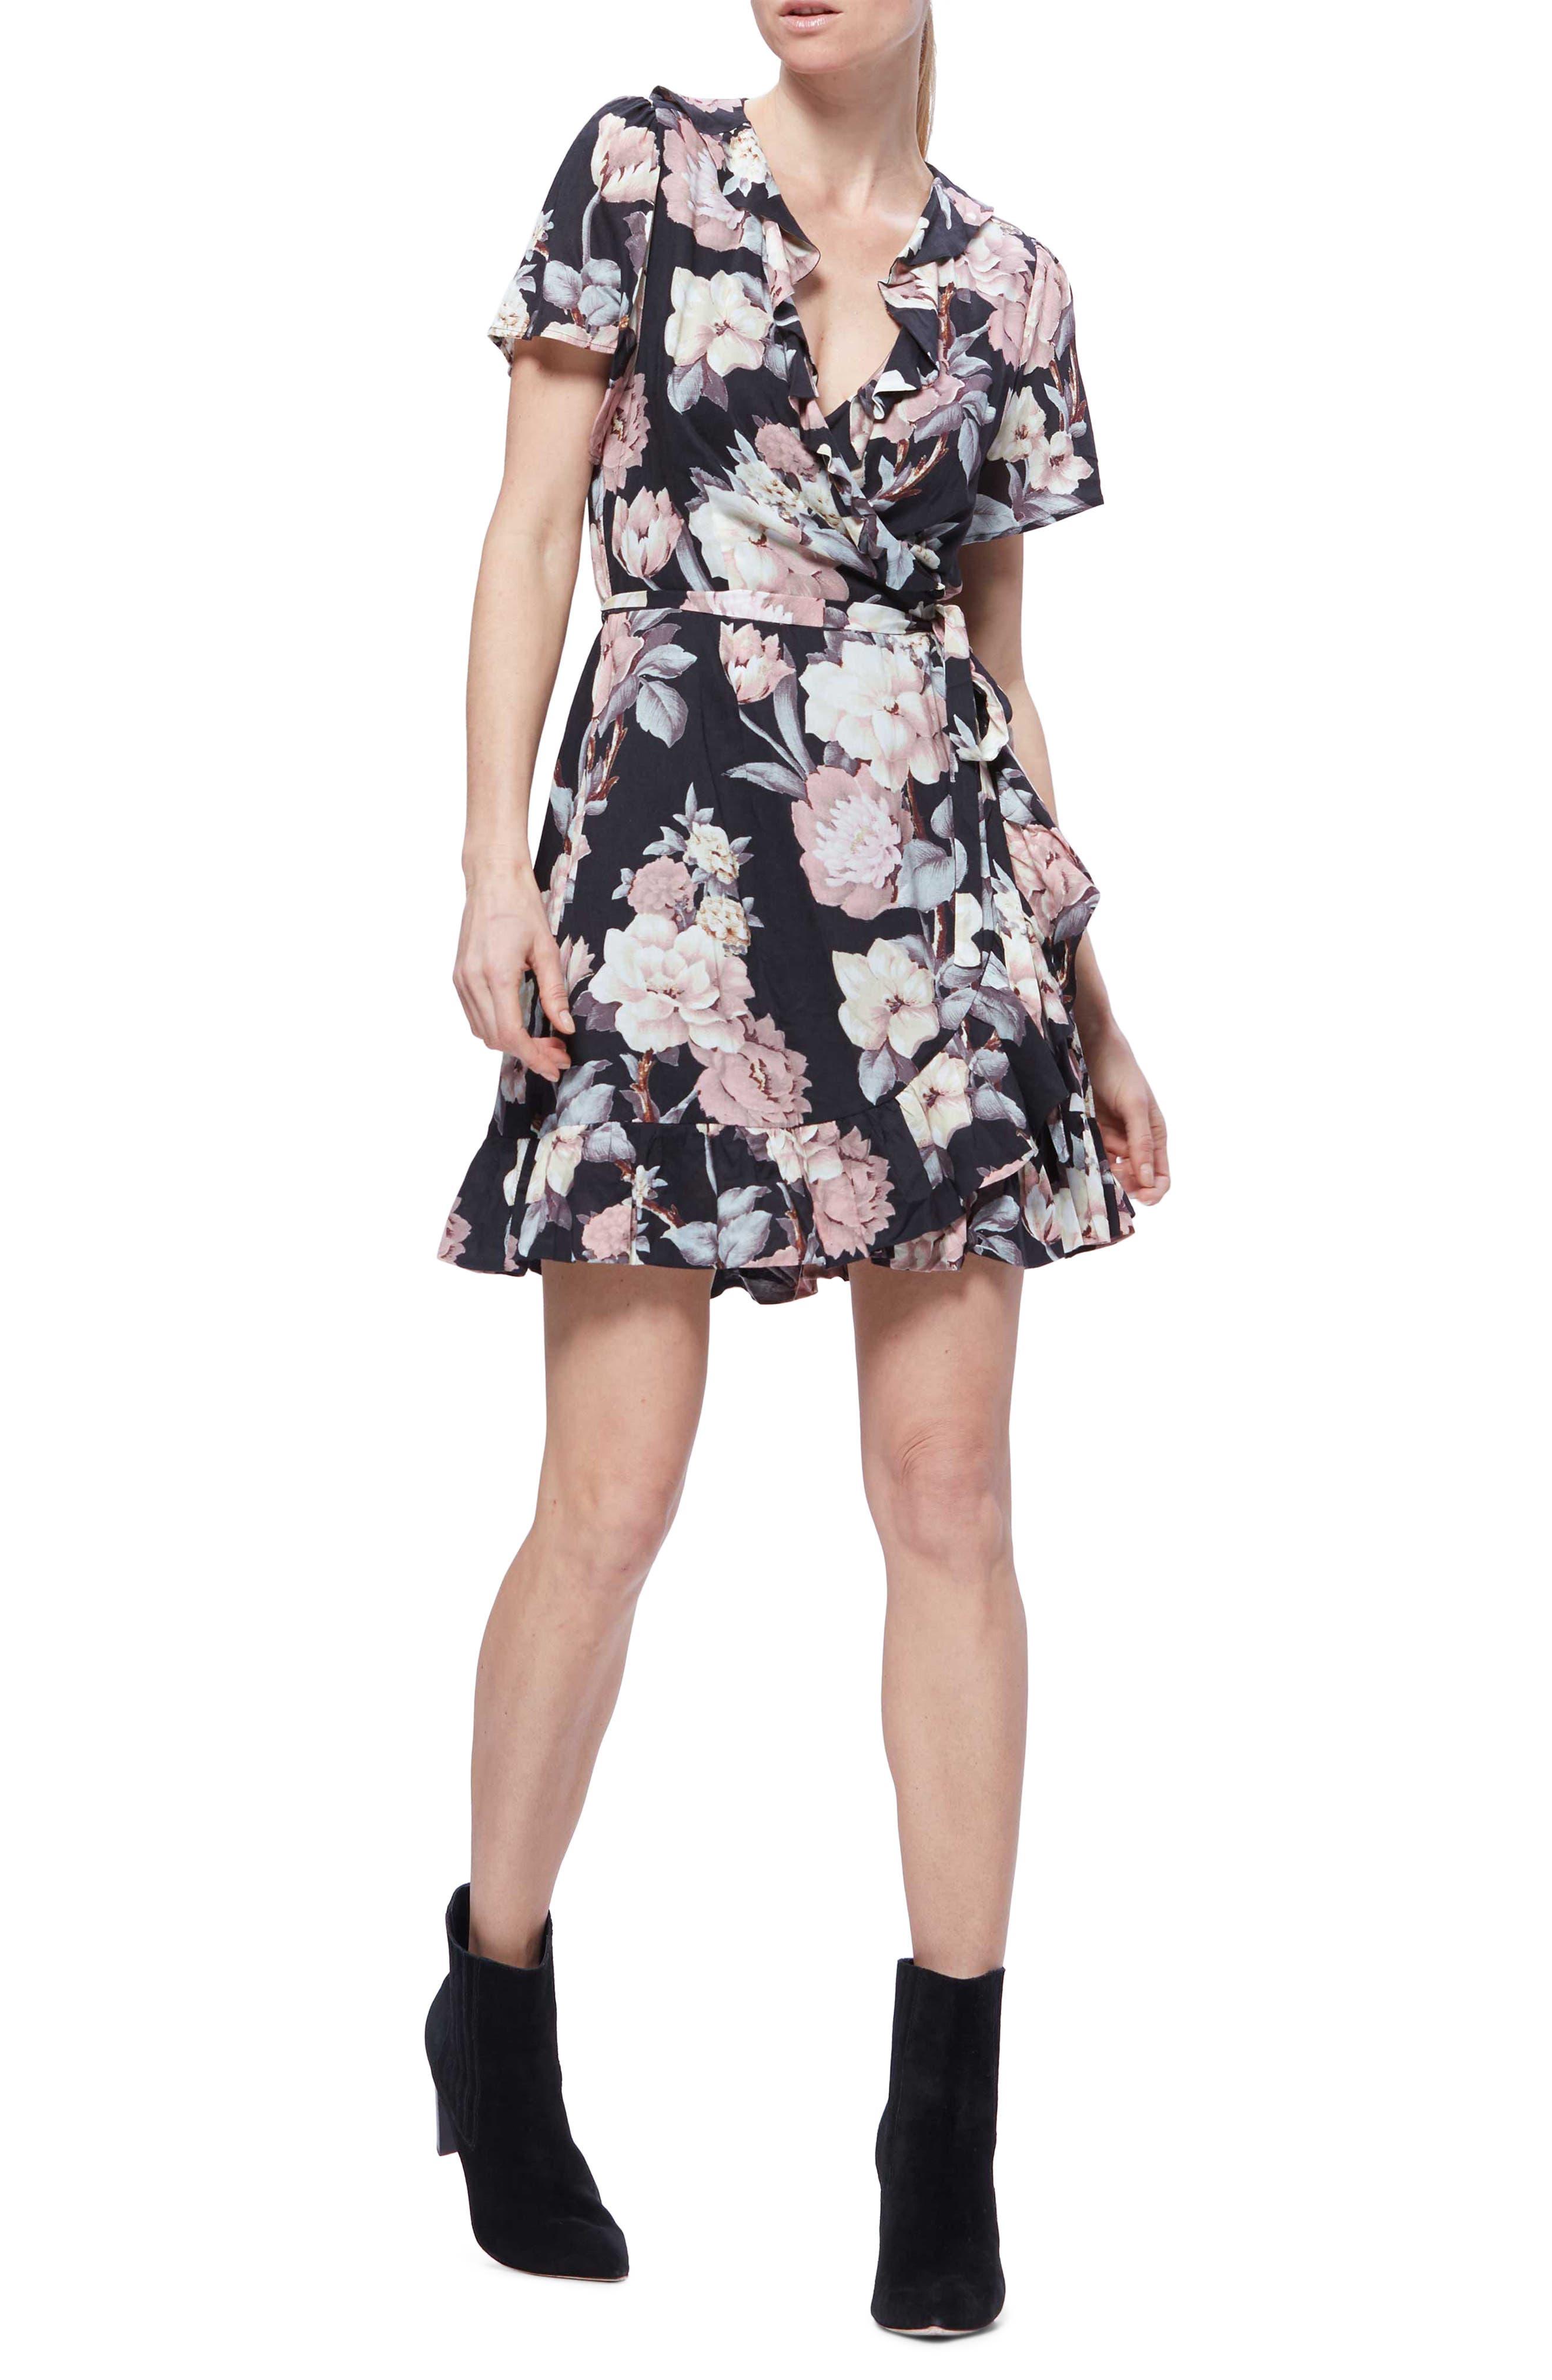 Paige Cardamom Floral Ruffle Detail Minidress